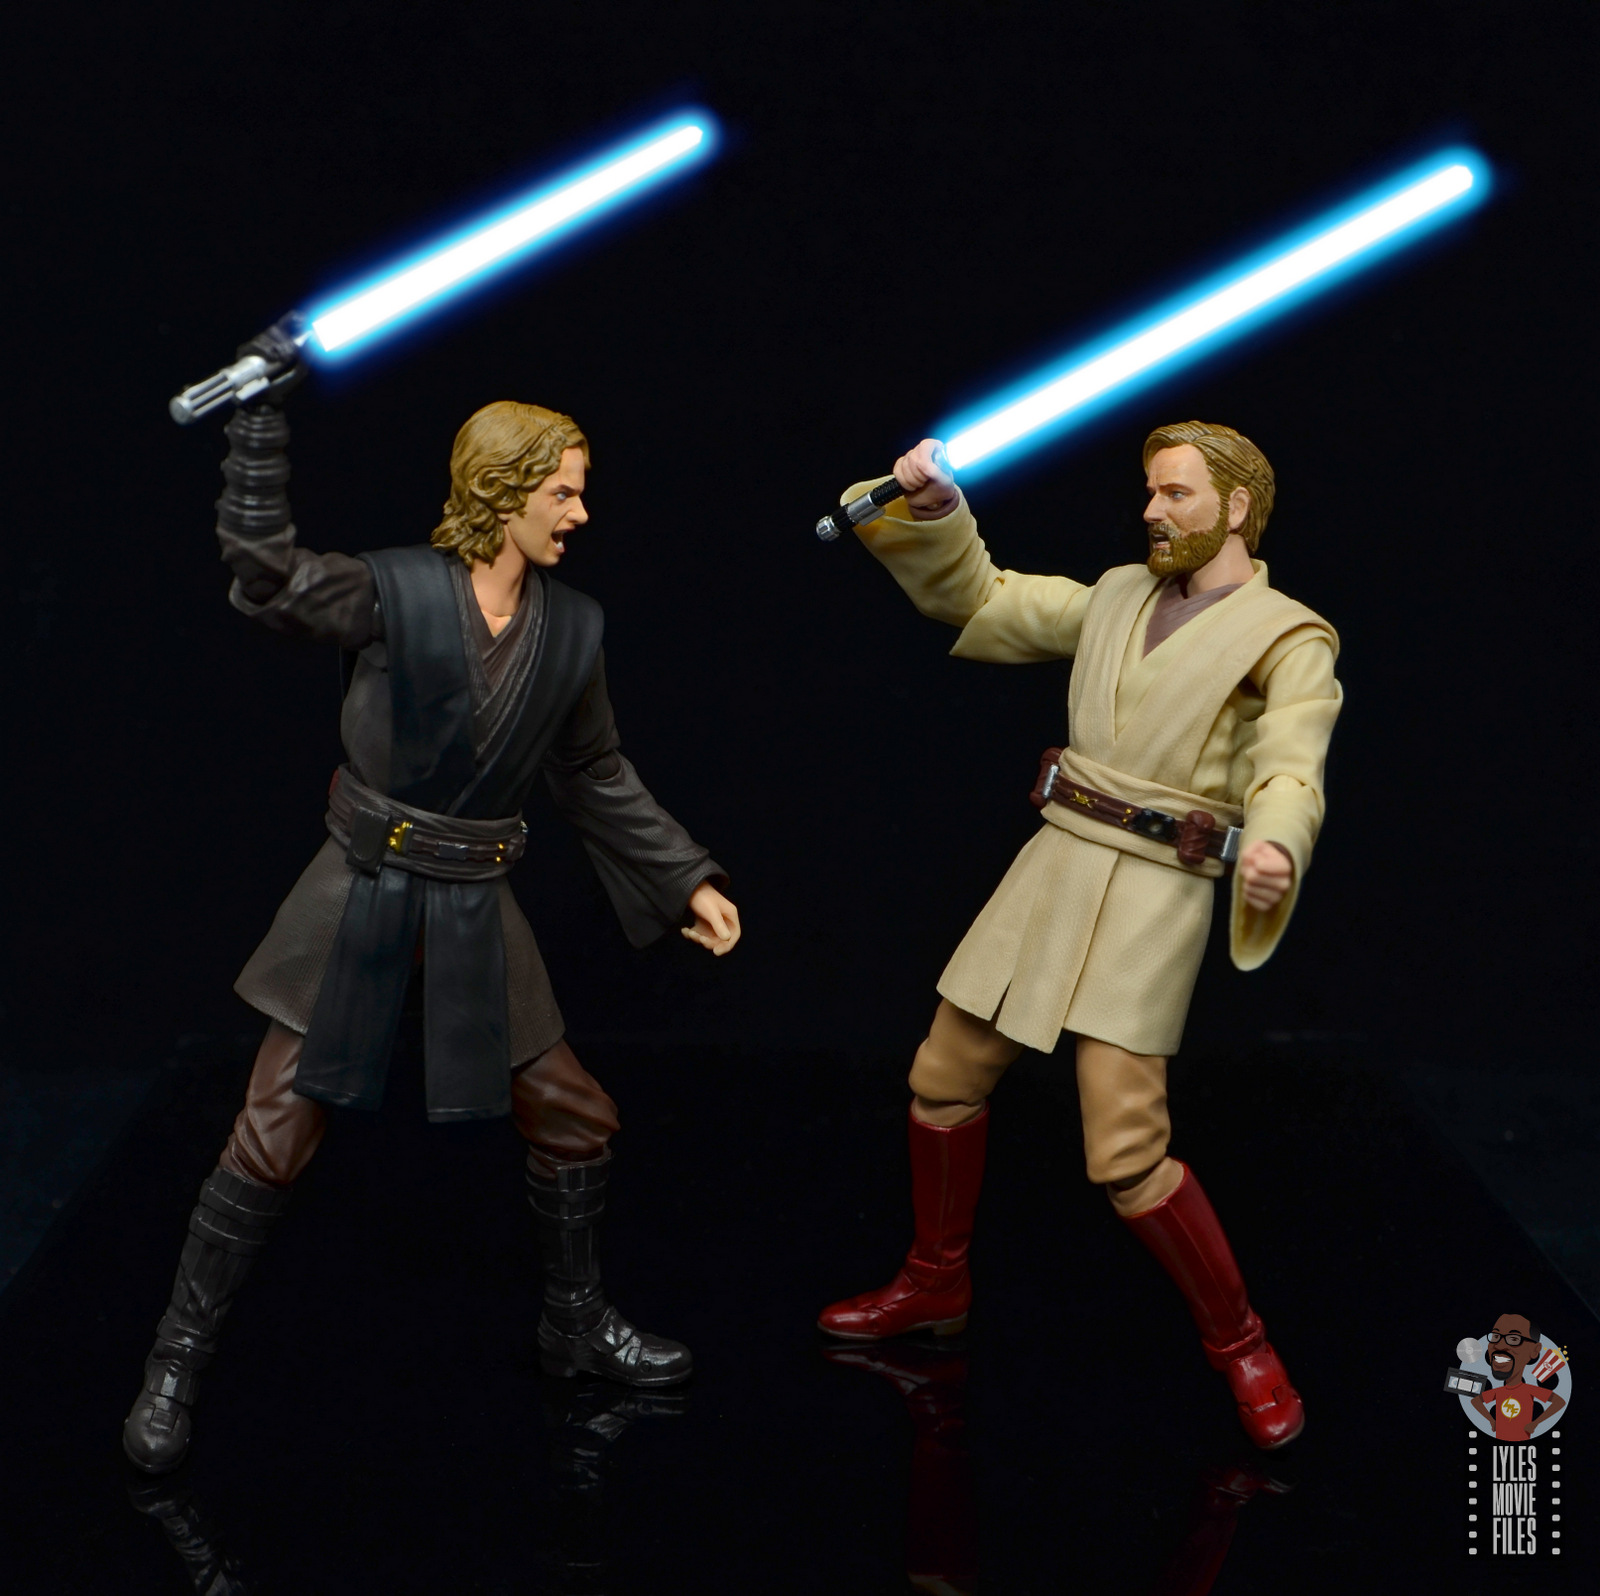 Sh Figuarts Obi Wan Kenobi Revenge Of The Sith Figure Review Fighting Anakin Lyles Movie Files